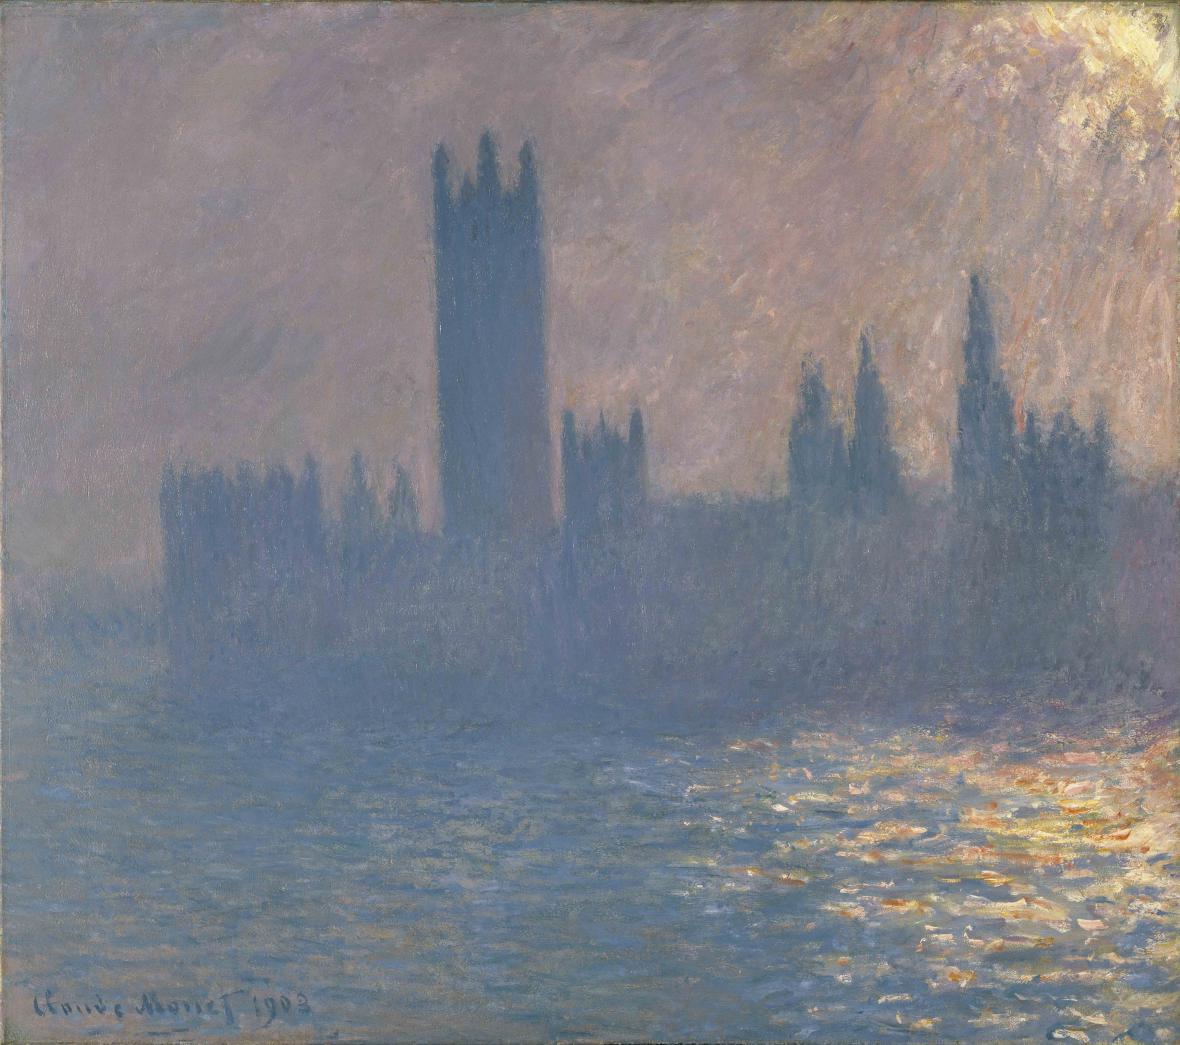 Claude Monet / Houses of Parliament, Sunlight Effect, 1903